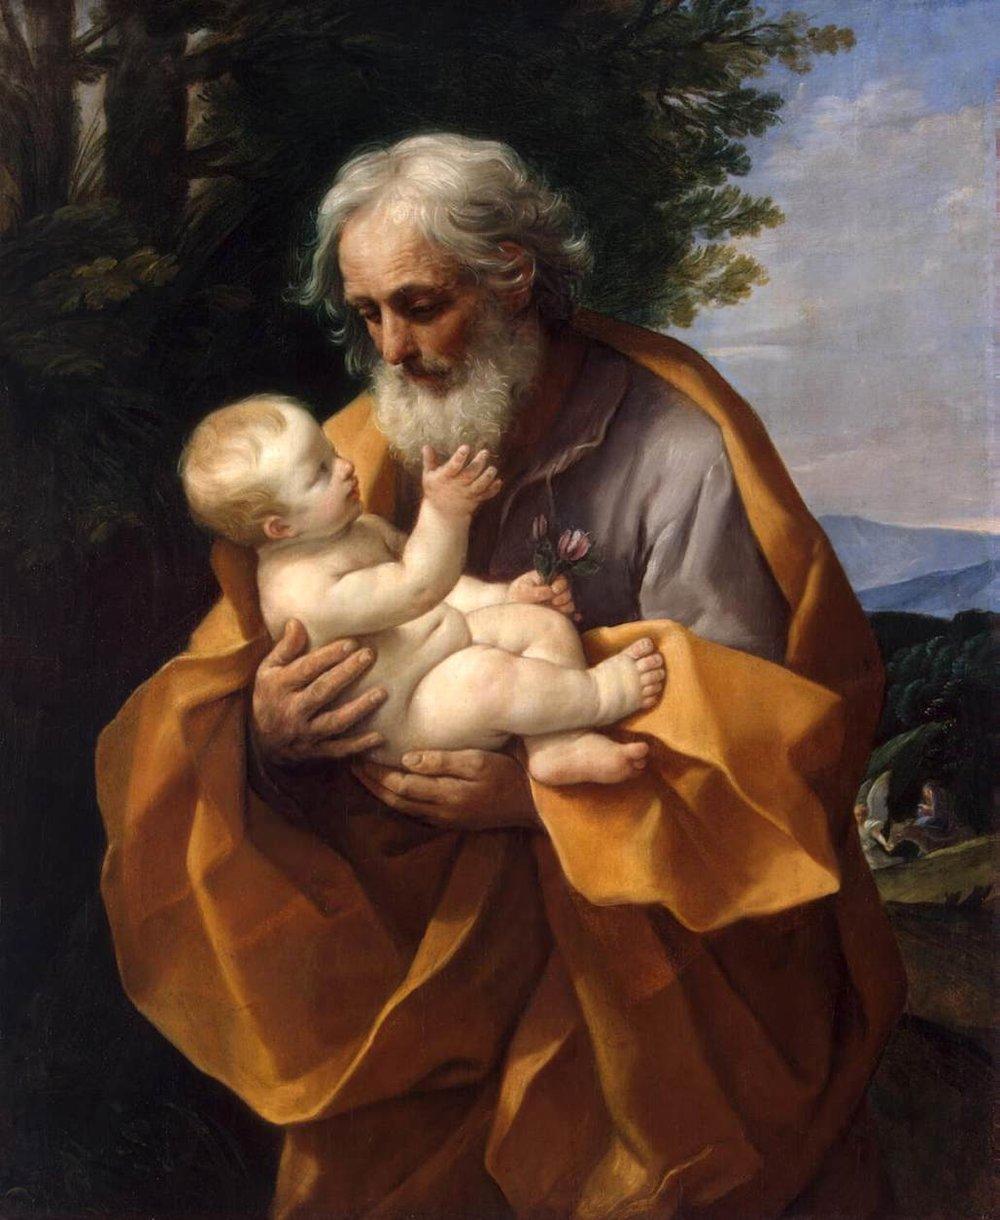 St. Joseph and Jesus by Guido Reni